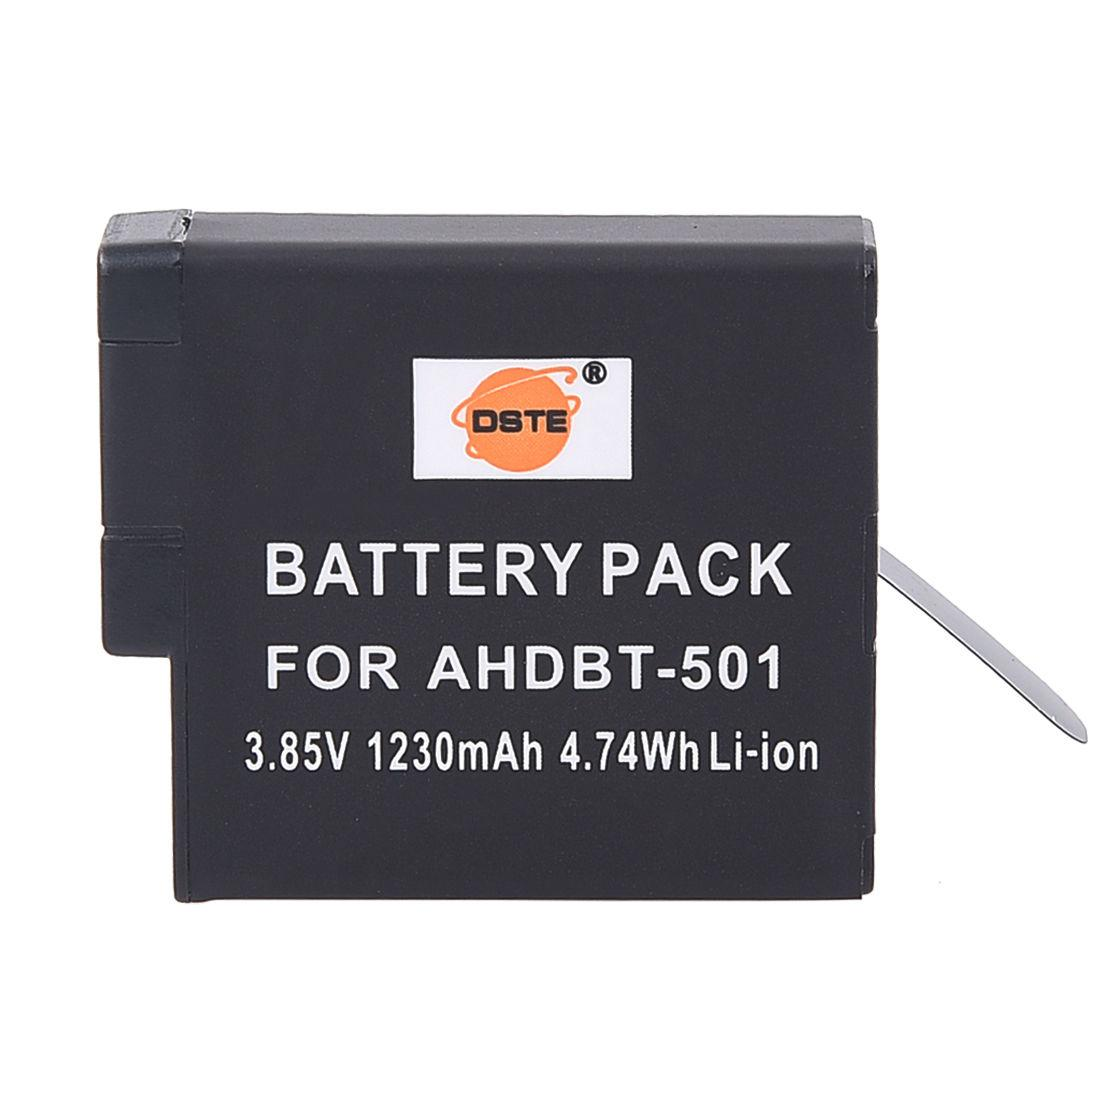 GoPro hero 5 Аккумуляторы  / 1230 mAh/ 3.85V / 4.74Wh